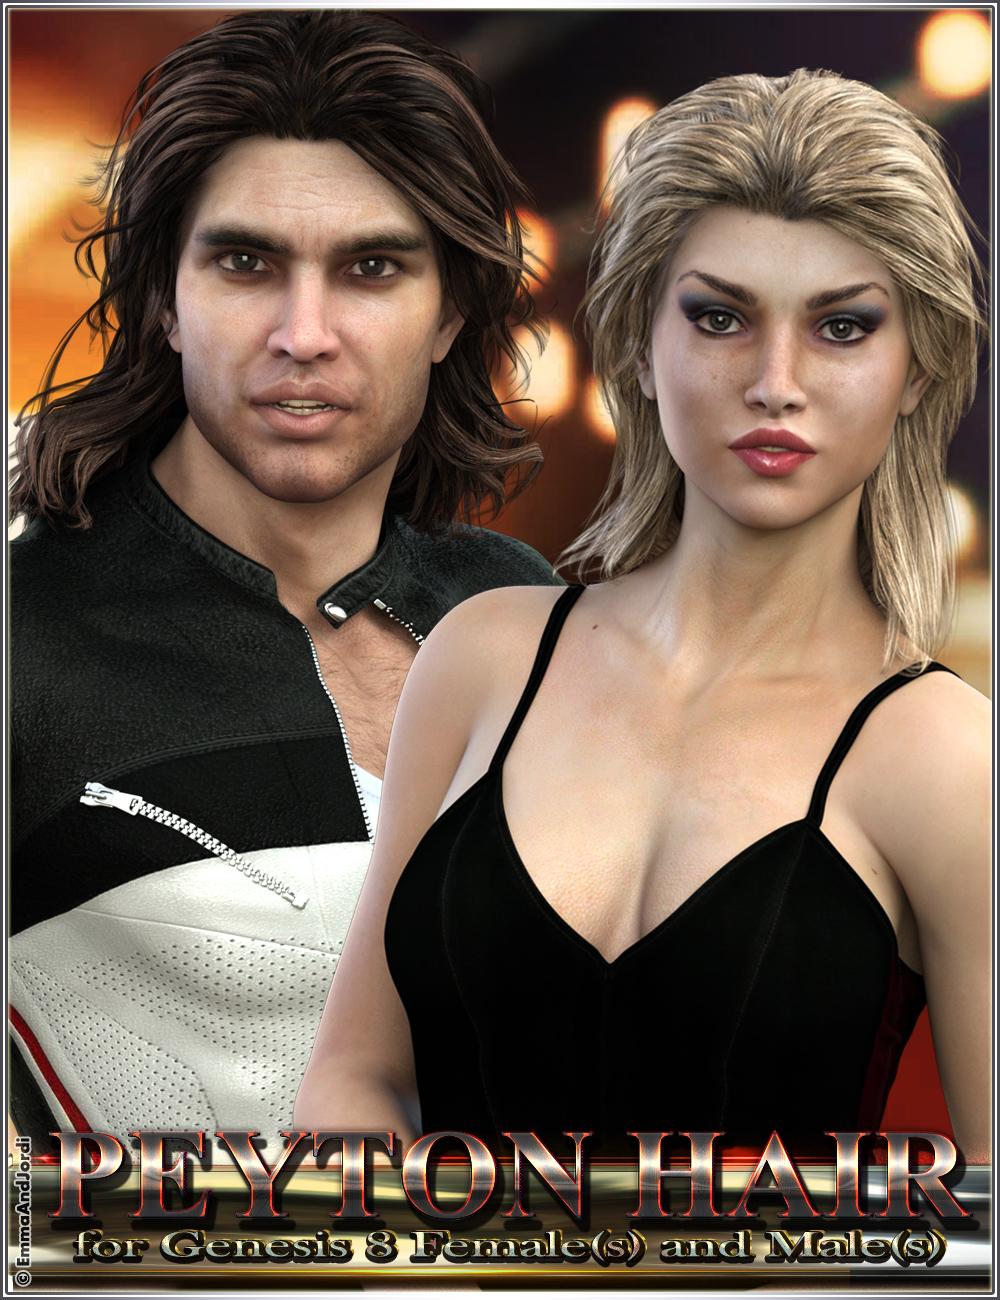 Peyton Hair for Genesis 8 by: EmmaAndJordi, 3D Models by Daz 3D